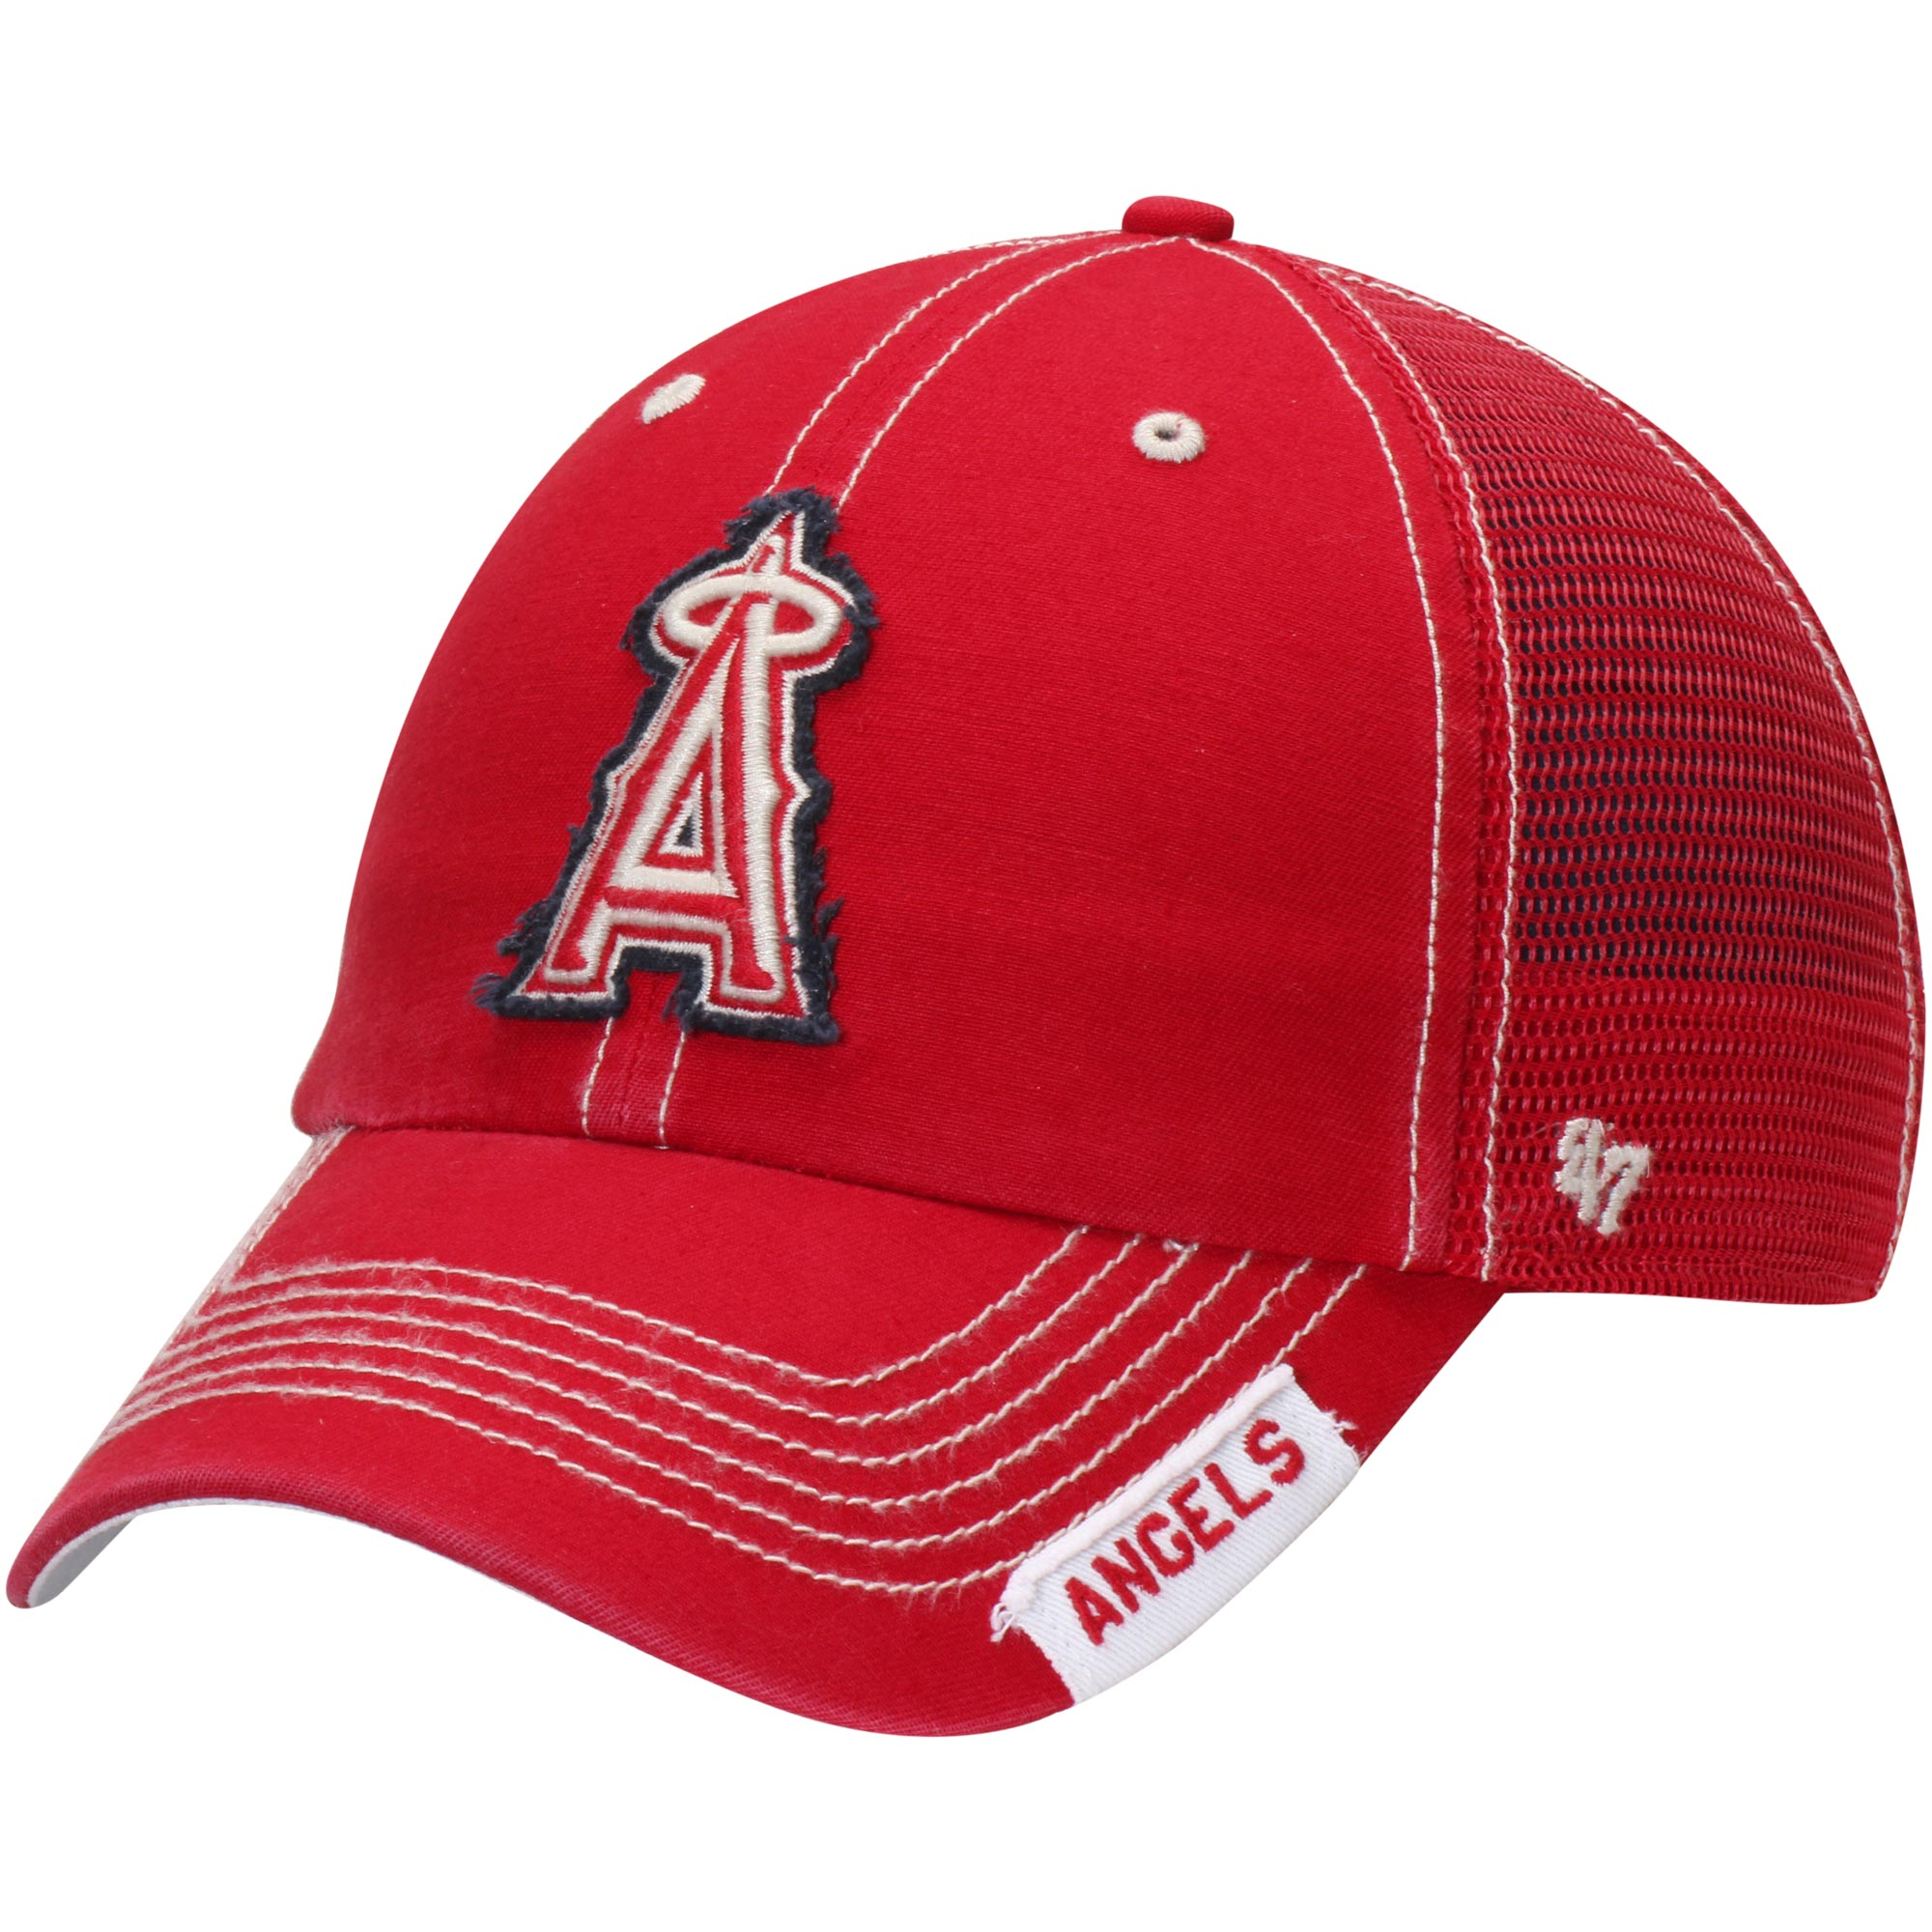 Los Angeles Angels '47 Turner Clean-Up Adjustable Hat - Red - OSFA